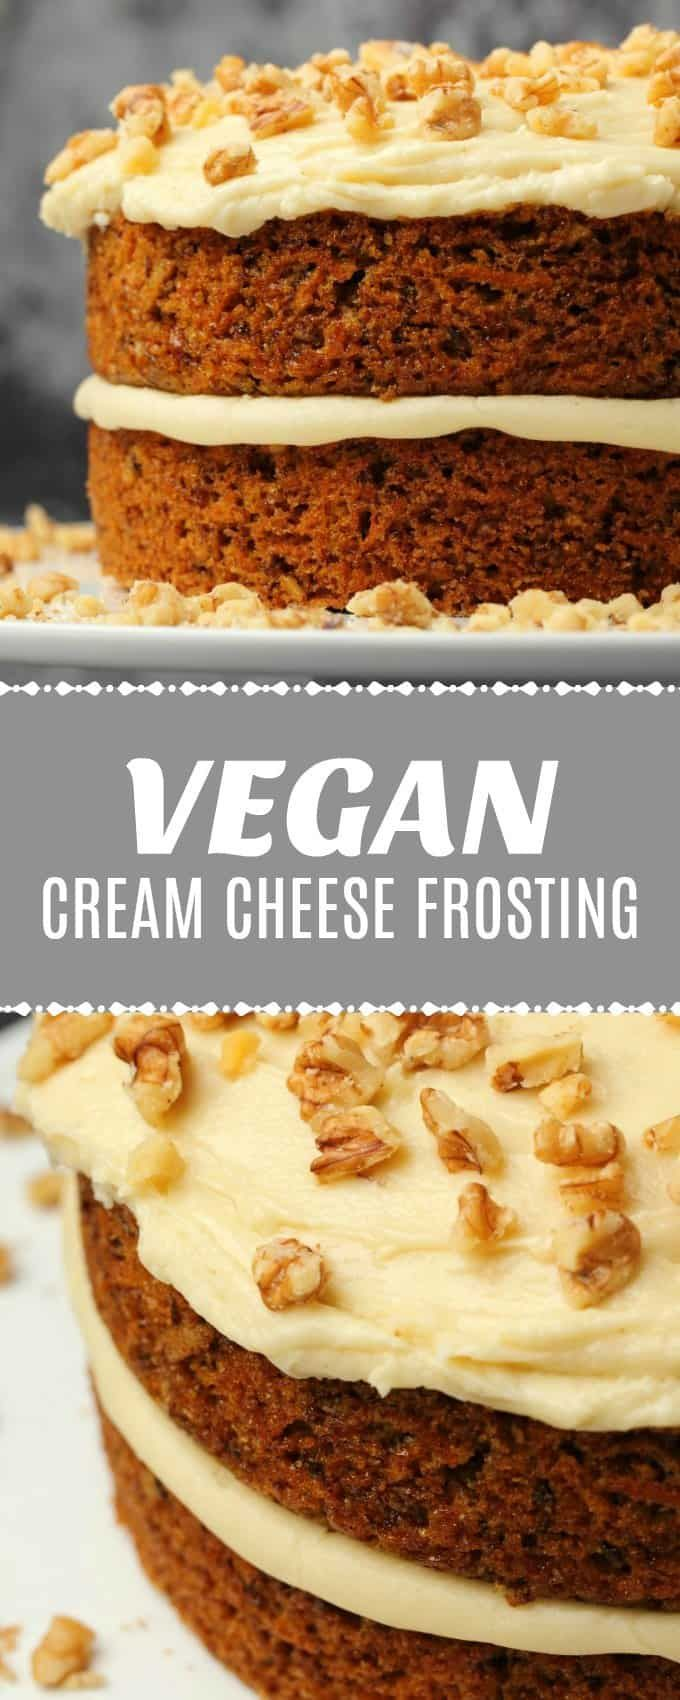 Creamy And Tangy Vegan Cream Cheese Frosting Made With Homemade Vegan Cream Cheese With Images Vegan Cream Cheese Vegan Cream Cheese Frosting Homemade Cream Cheese Recipe